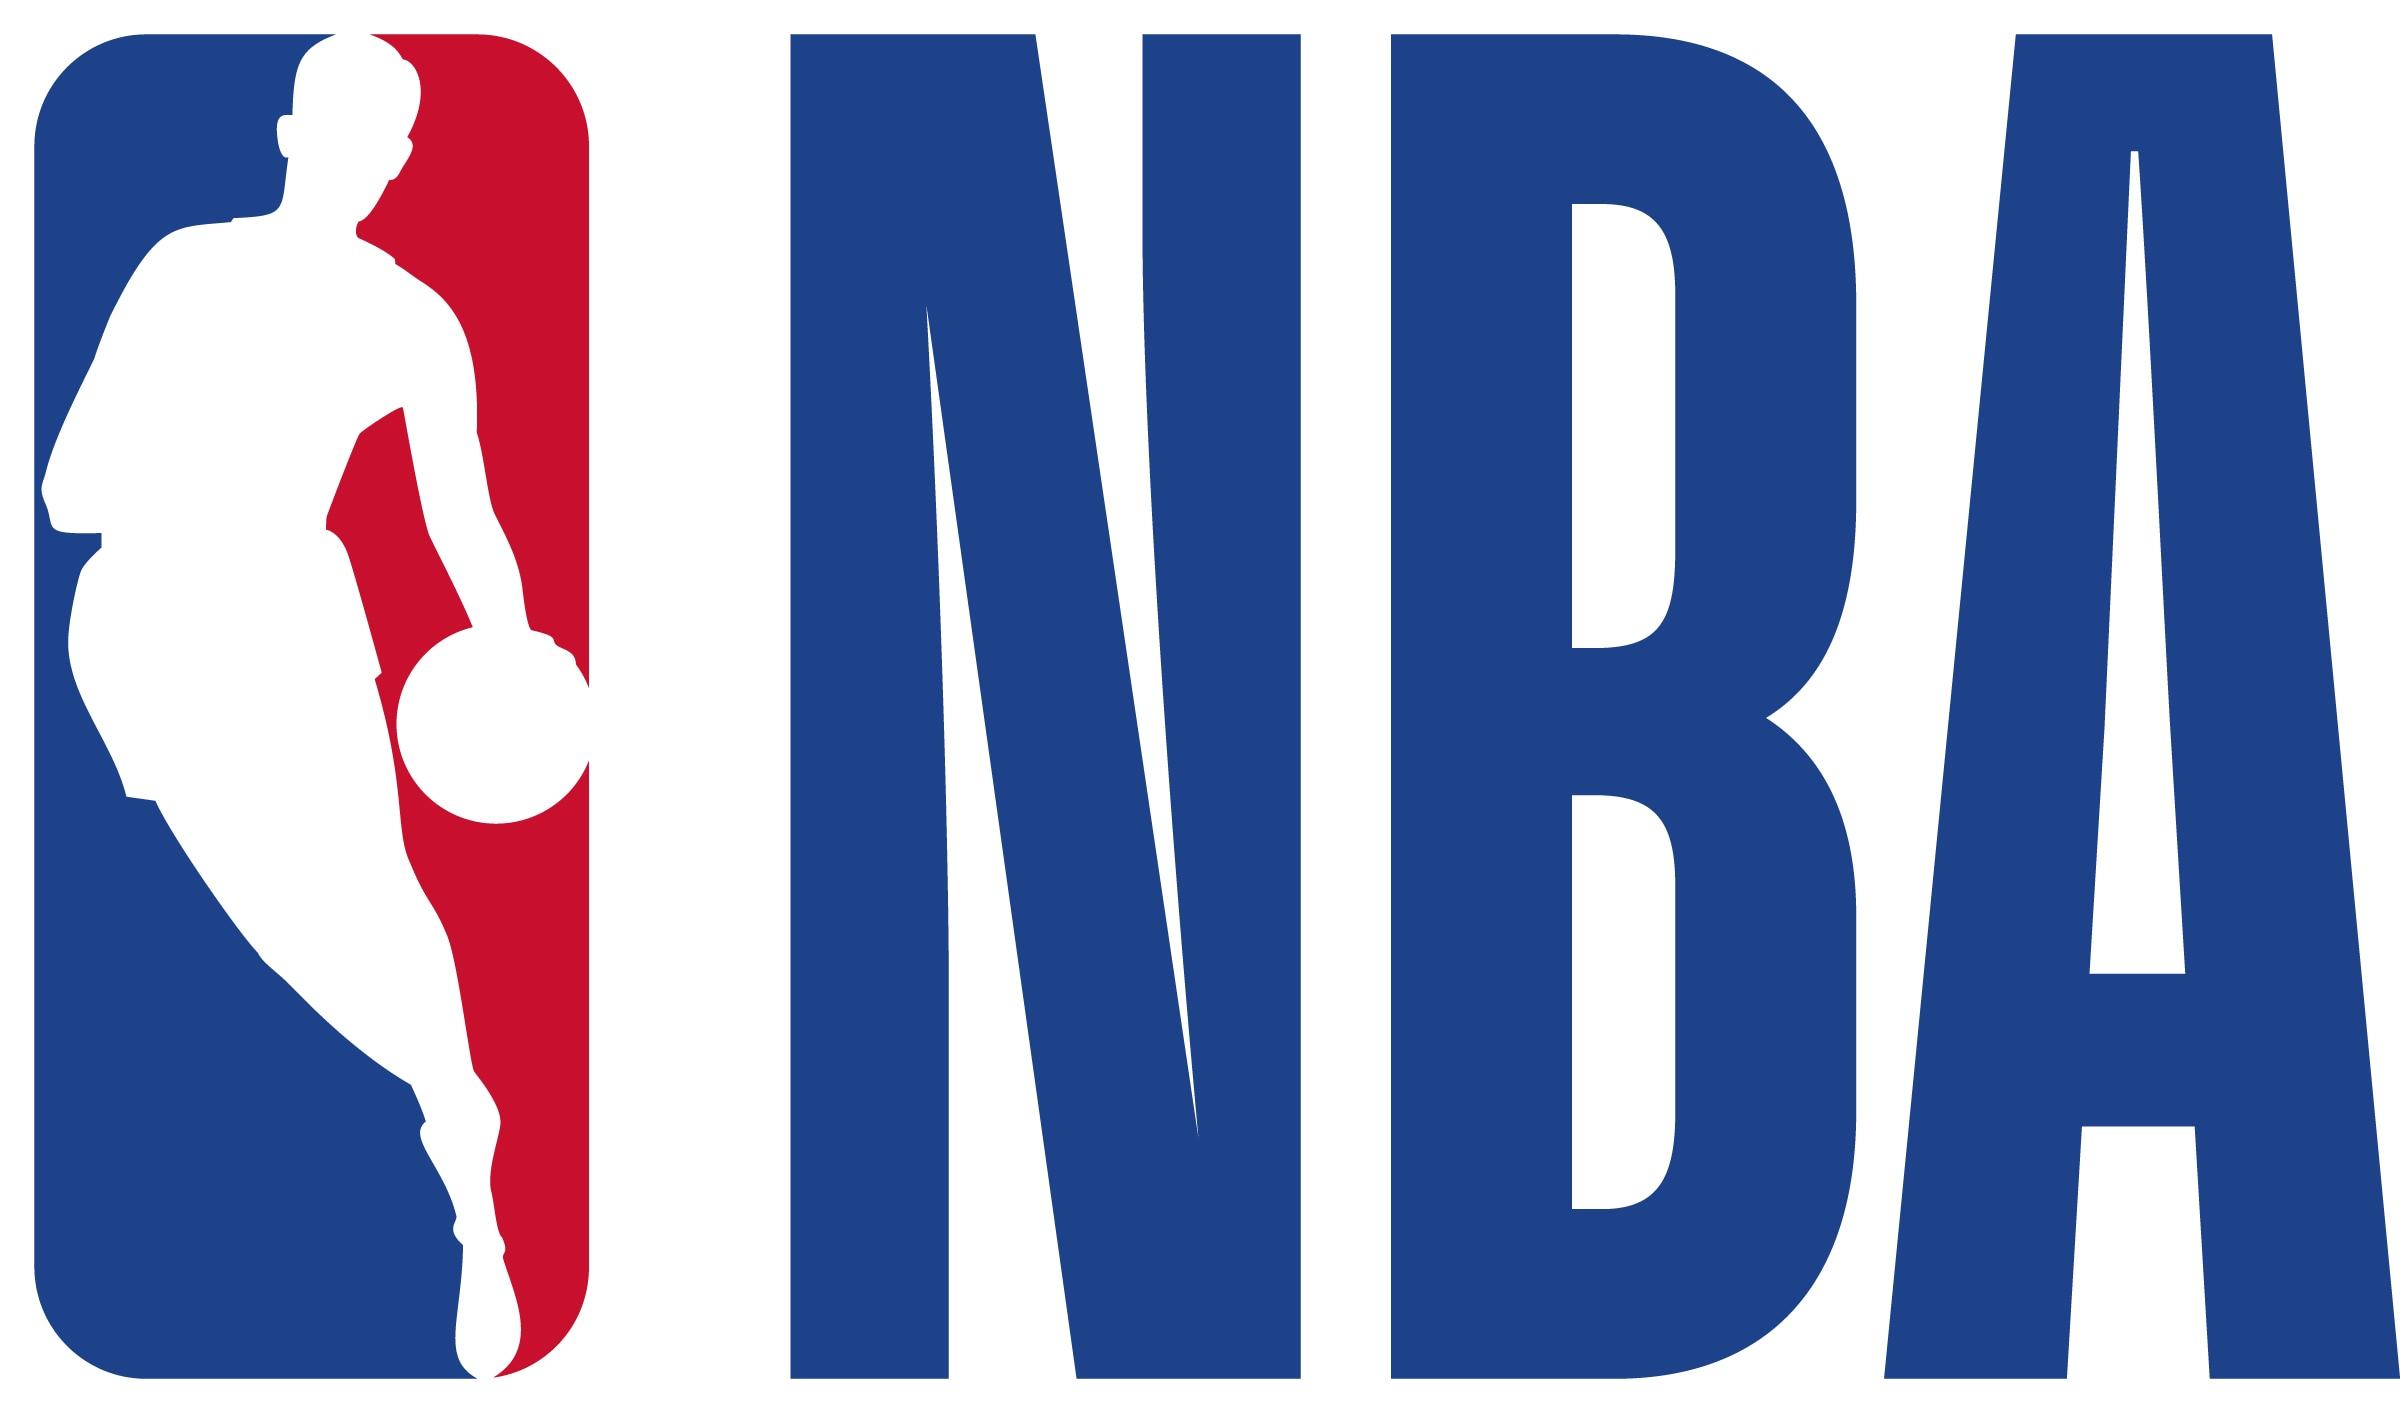 Key dates for 2021-22 NBA season